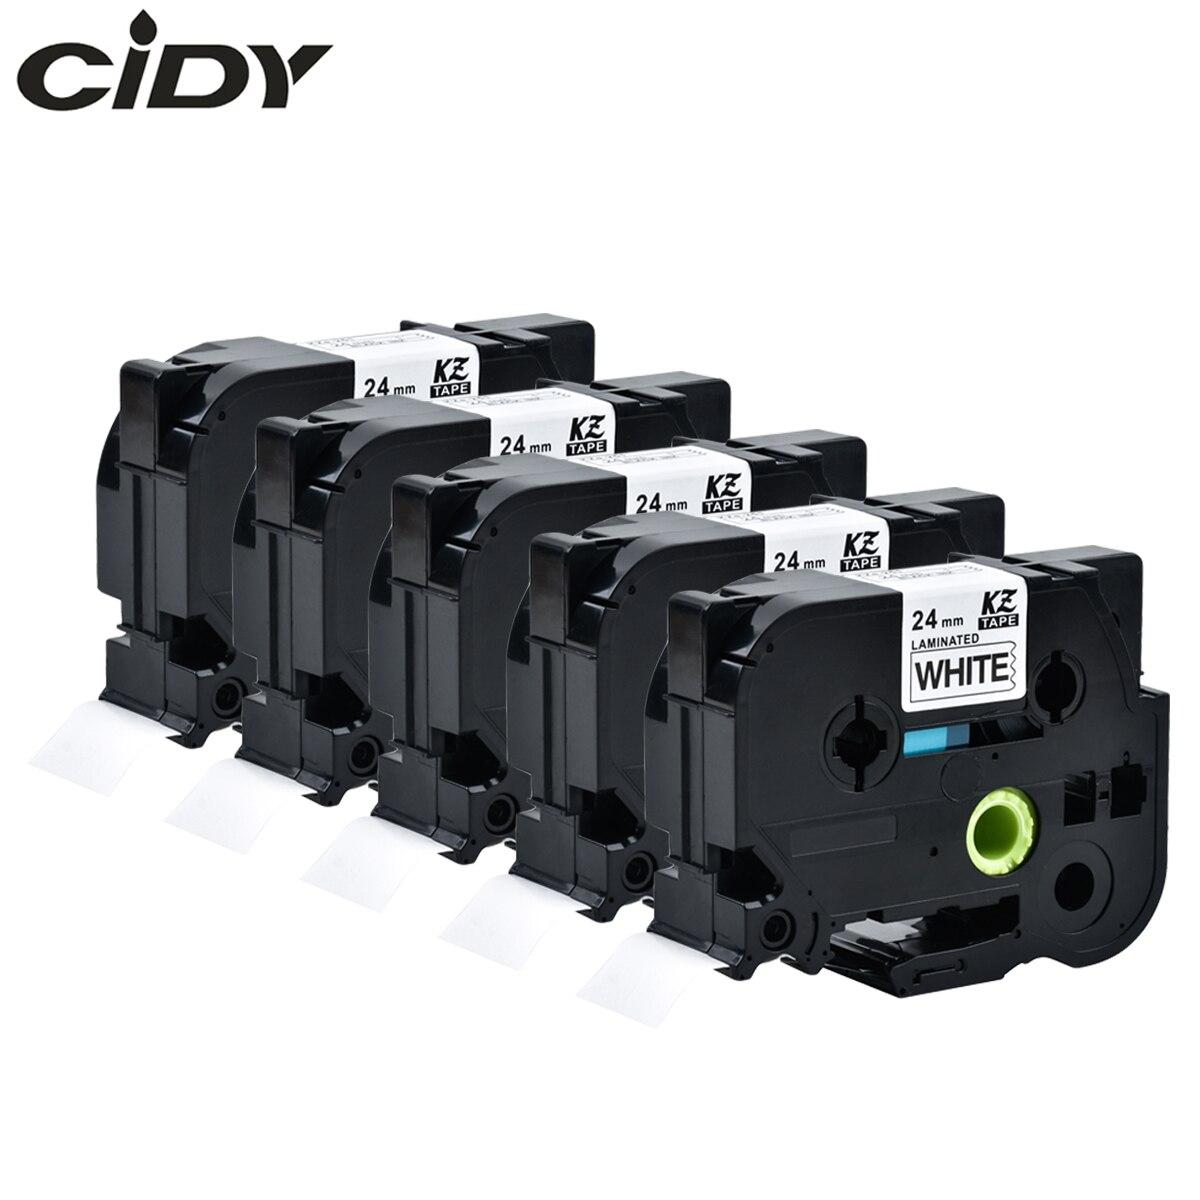 CIDY 5 uds Compatible p touch laminado tze 251 tz251 tze251 cinta 24mm negro sobre blanco cinta tze-251 tz-251 para Impresoras brother